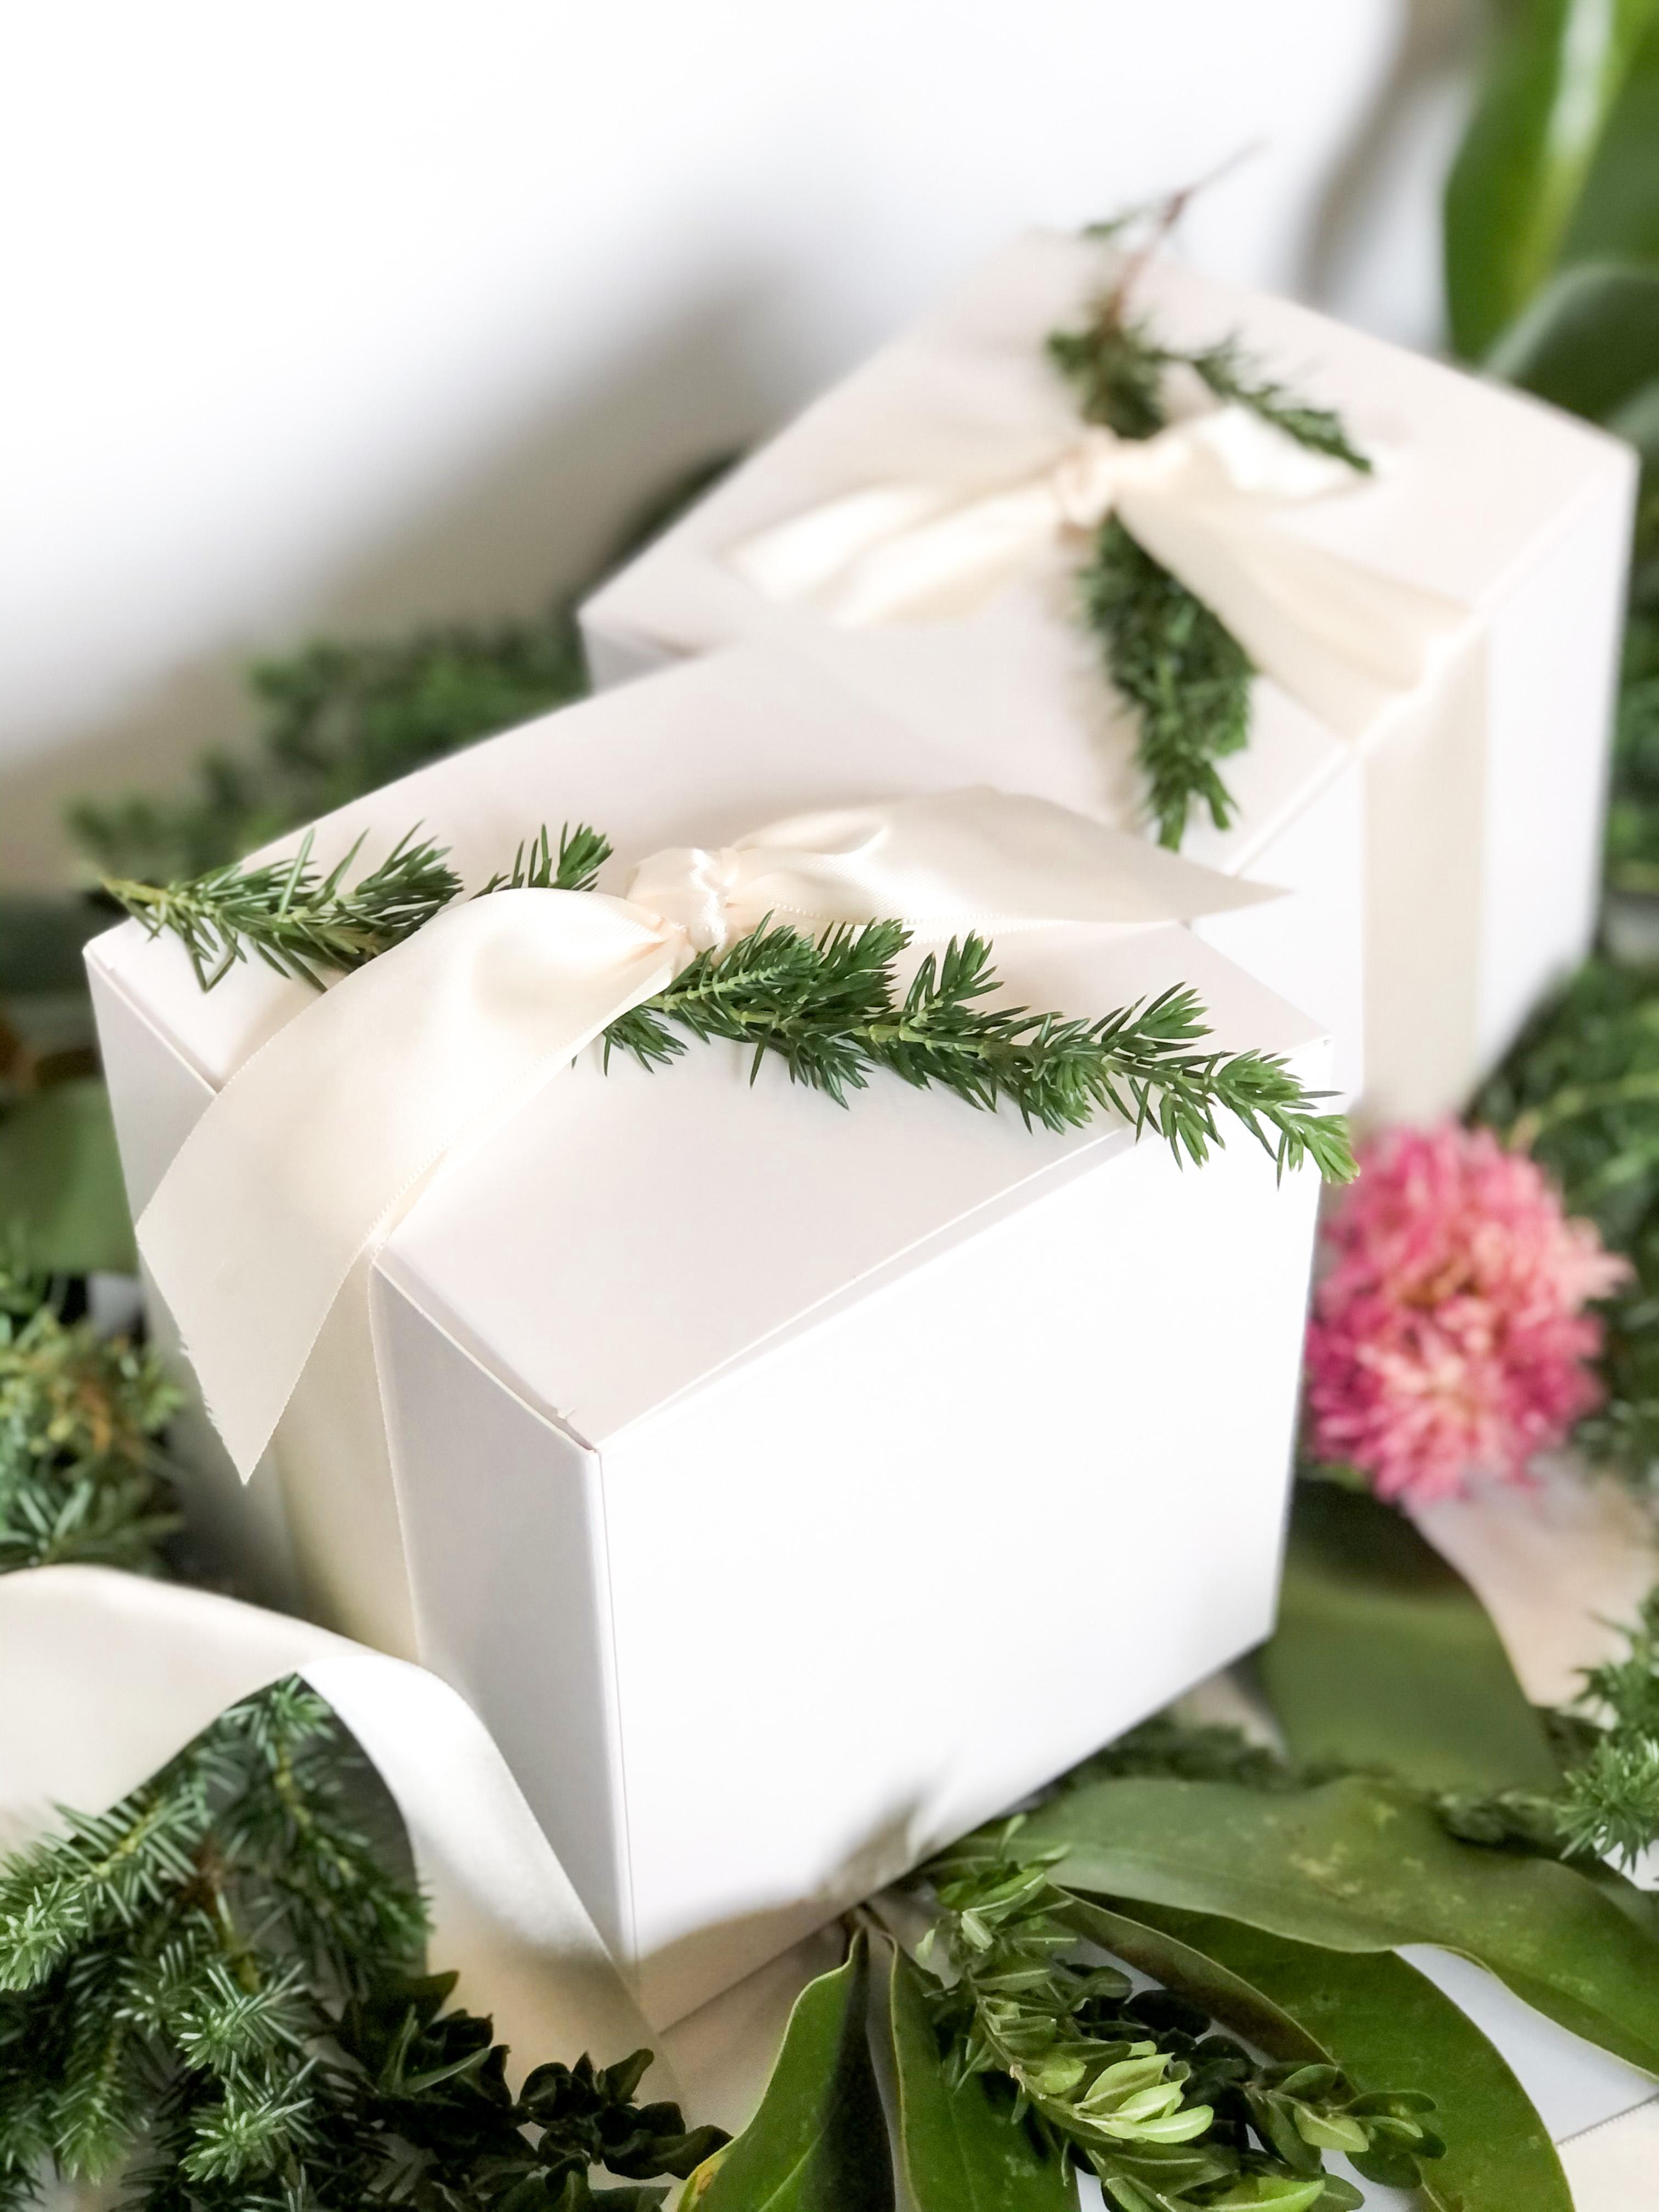 2020 Christmas ornament gift box